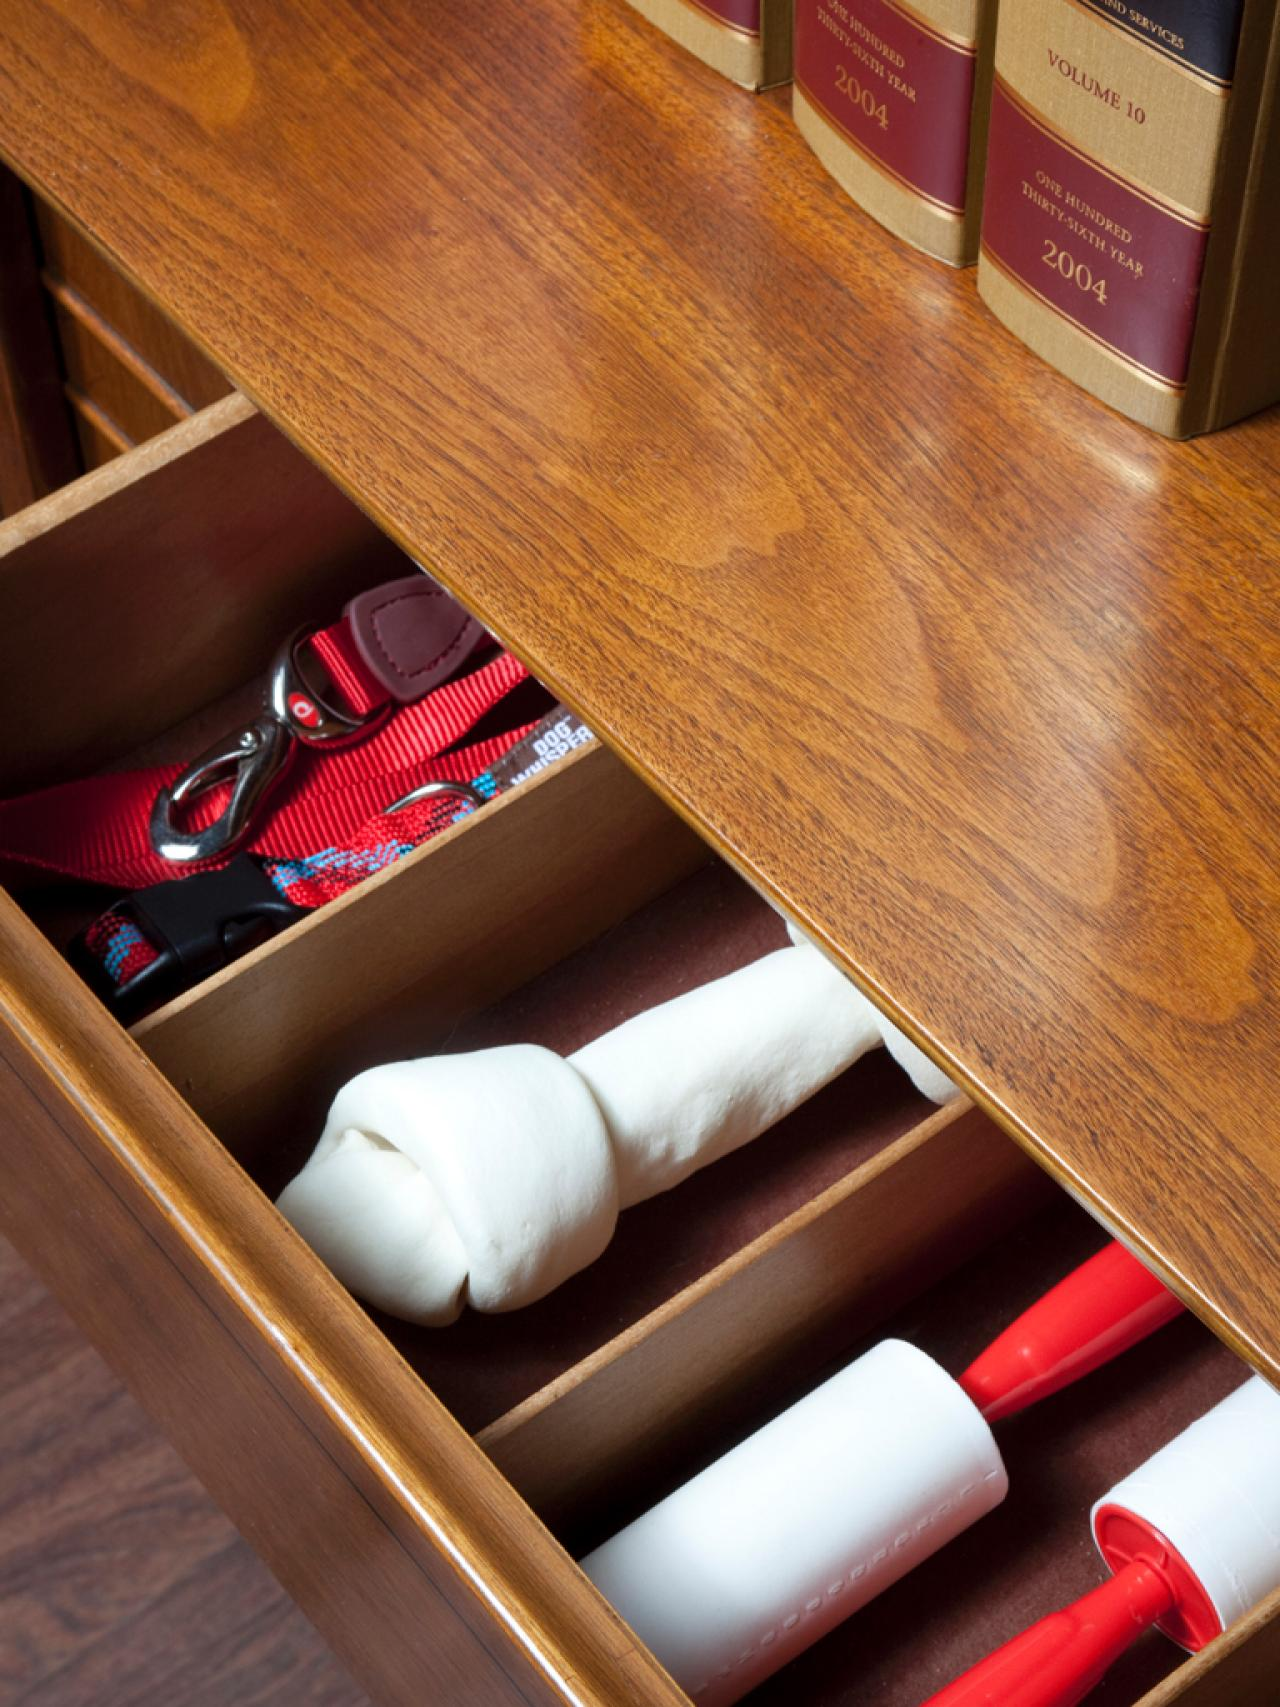 Rwap pet friendly room drawer storage detail s3x4.jpg.rend.hgtvcom.1280.1707